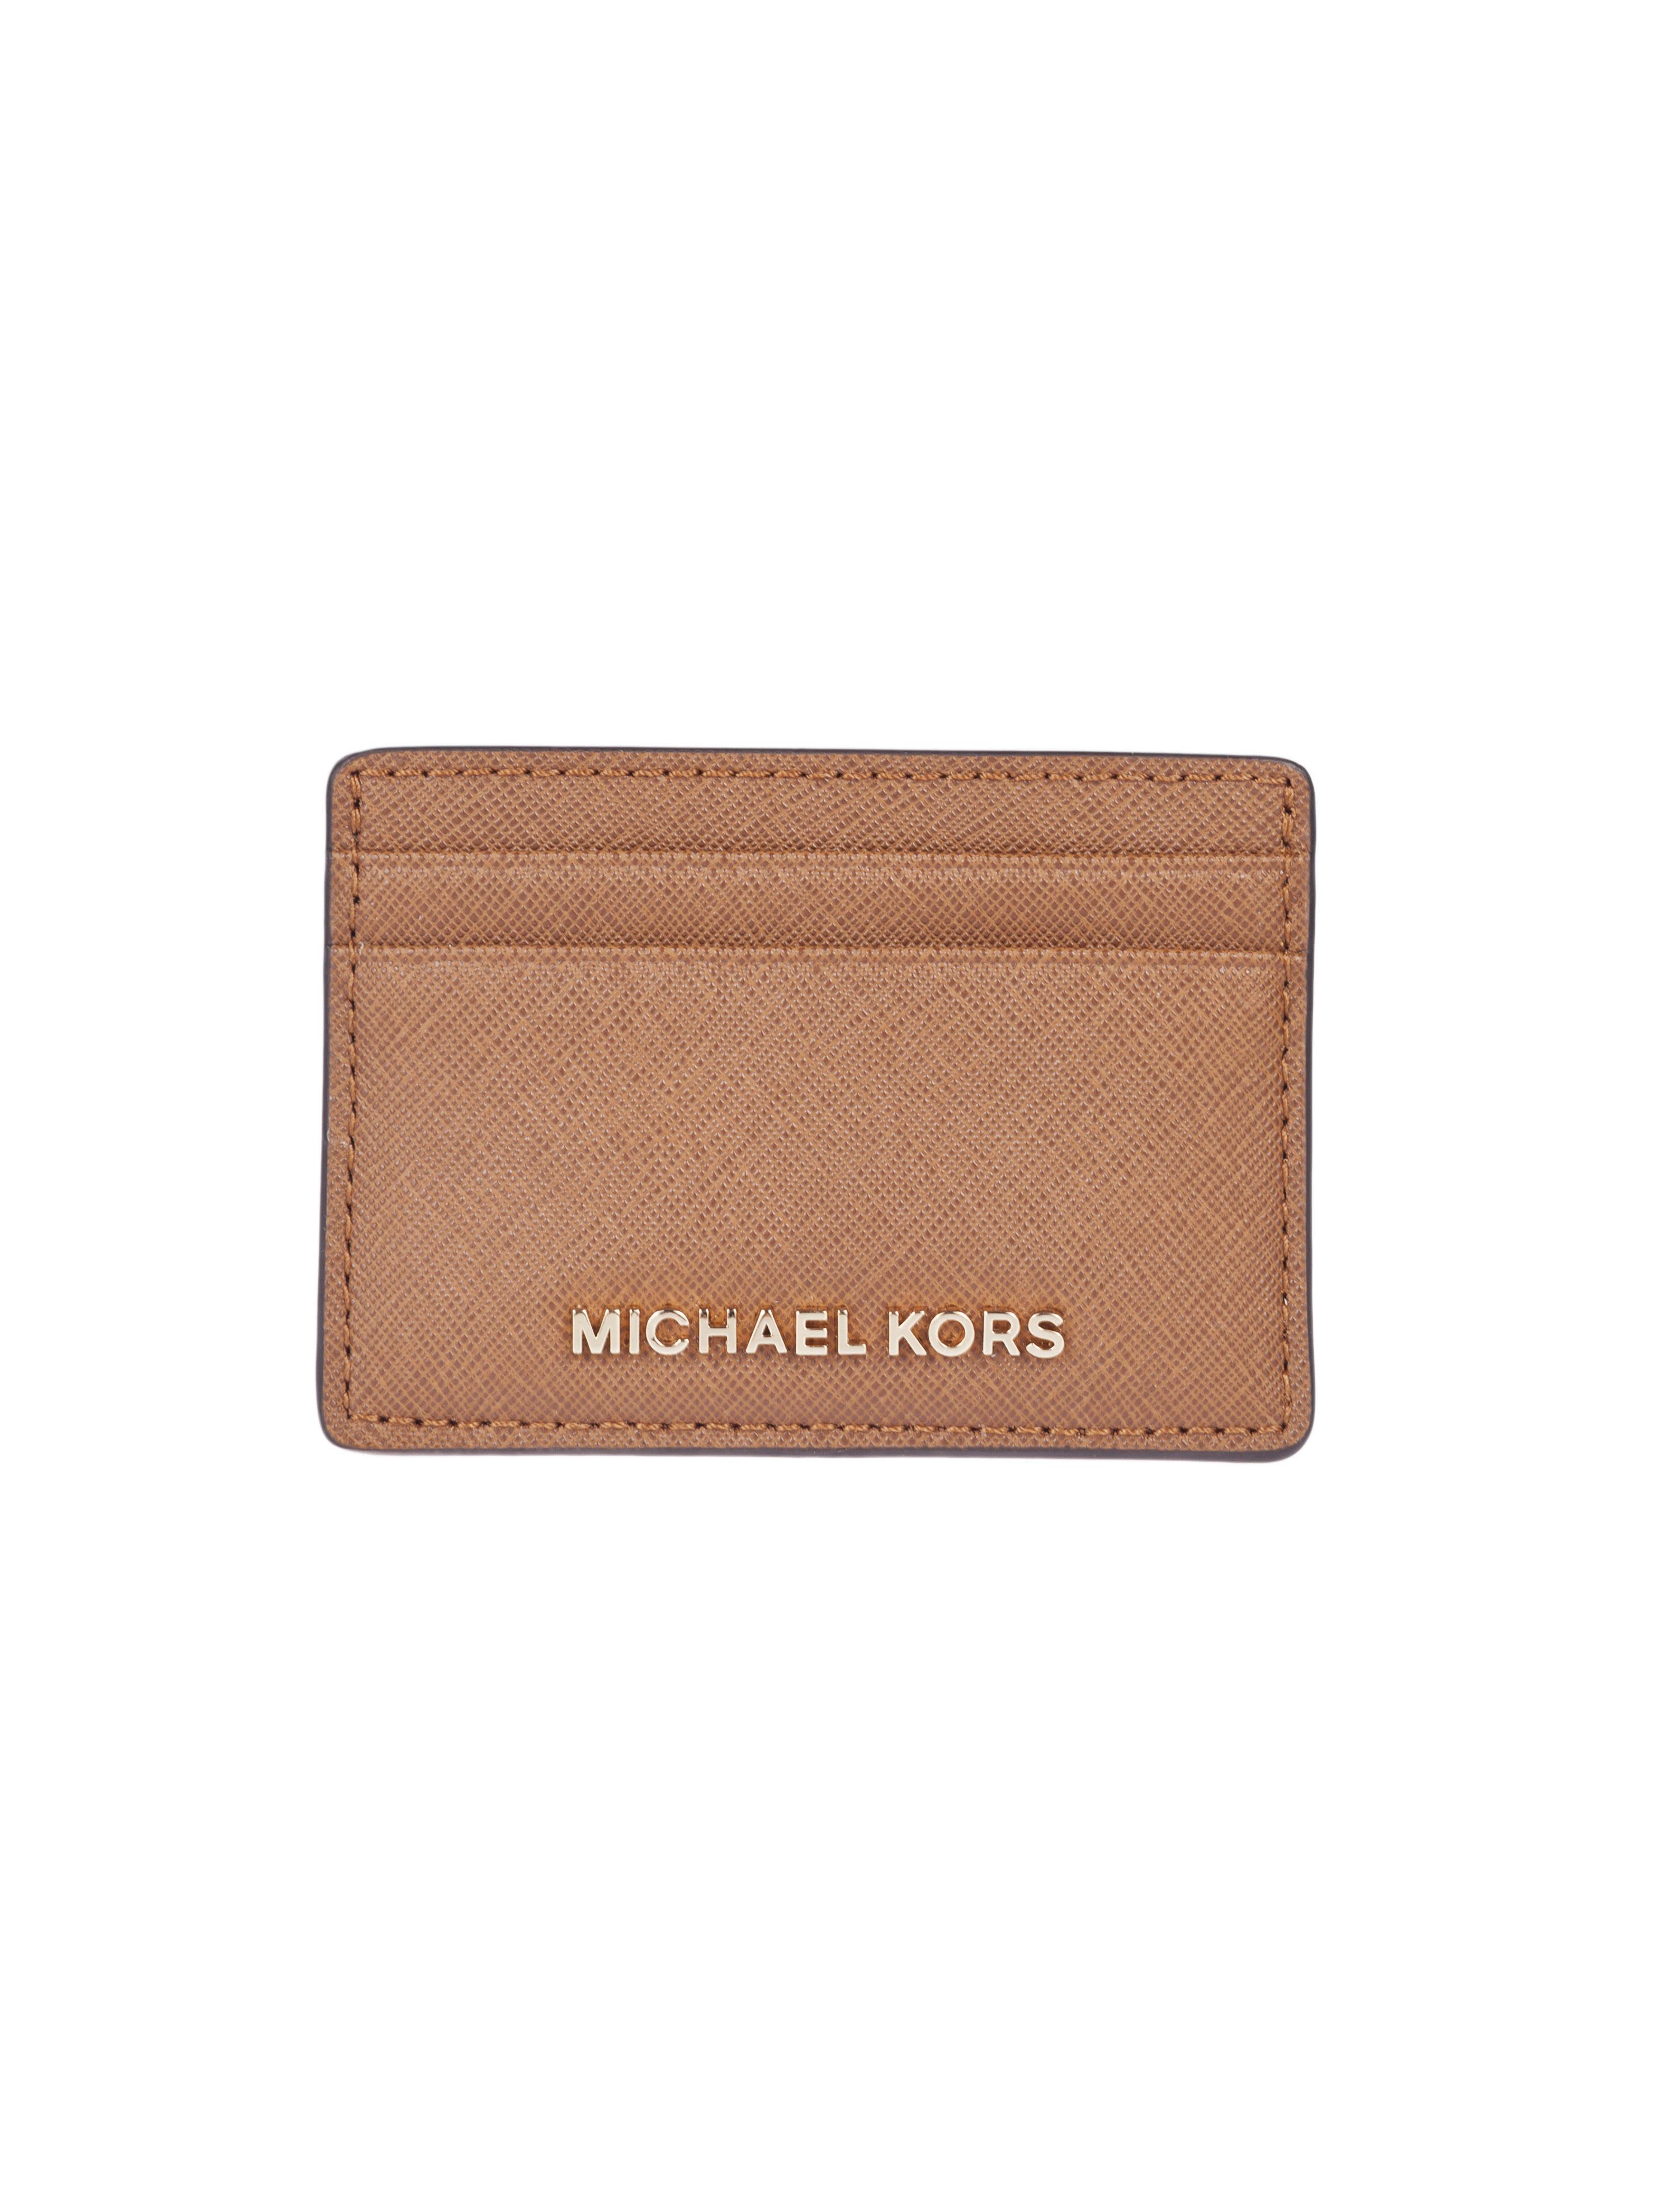 Michael Kors Jet Set Travel Cardholder